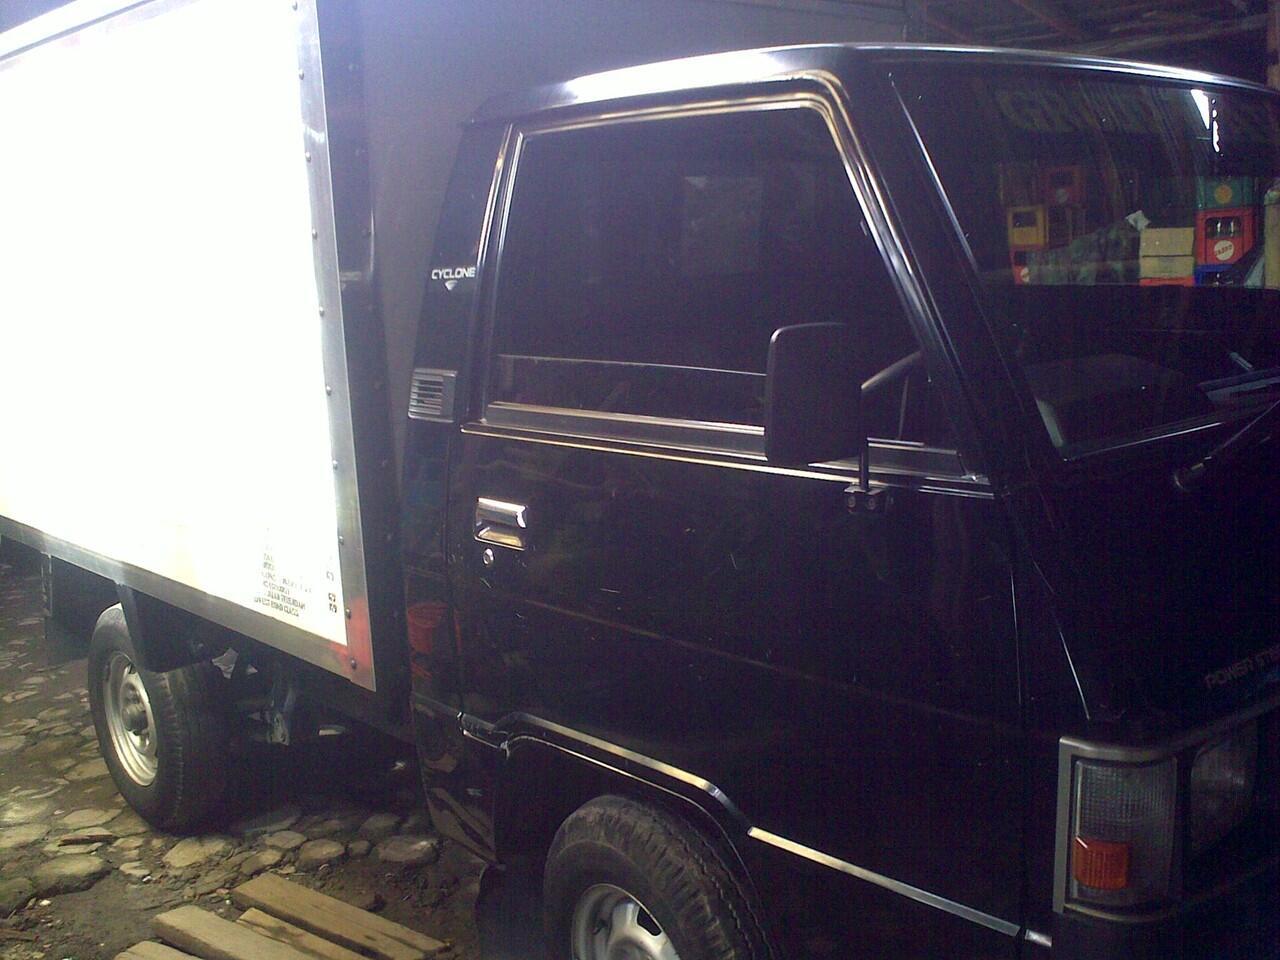 Terjual Mitsubishi L300 Box Istimewa Bandung Kaskus